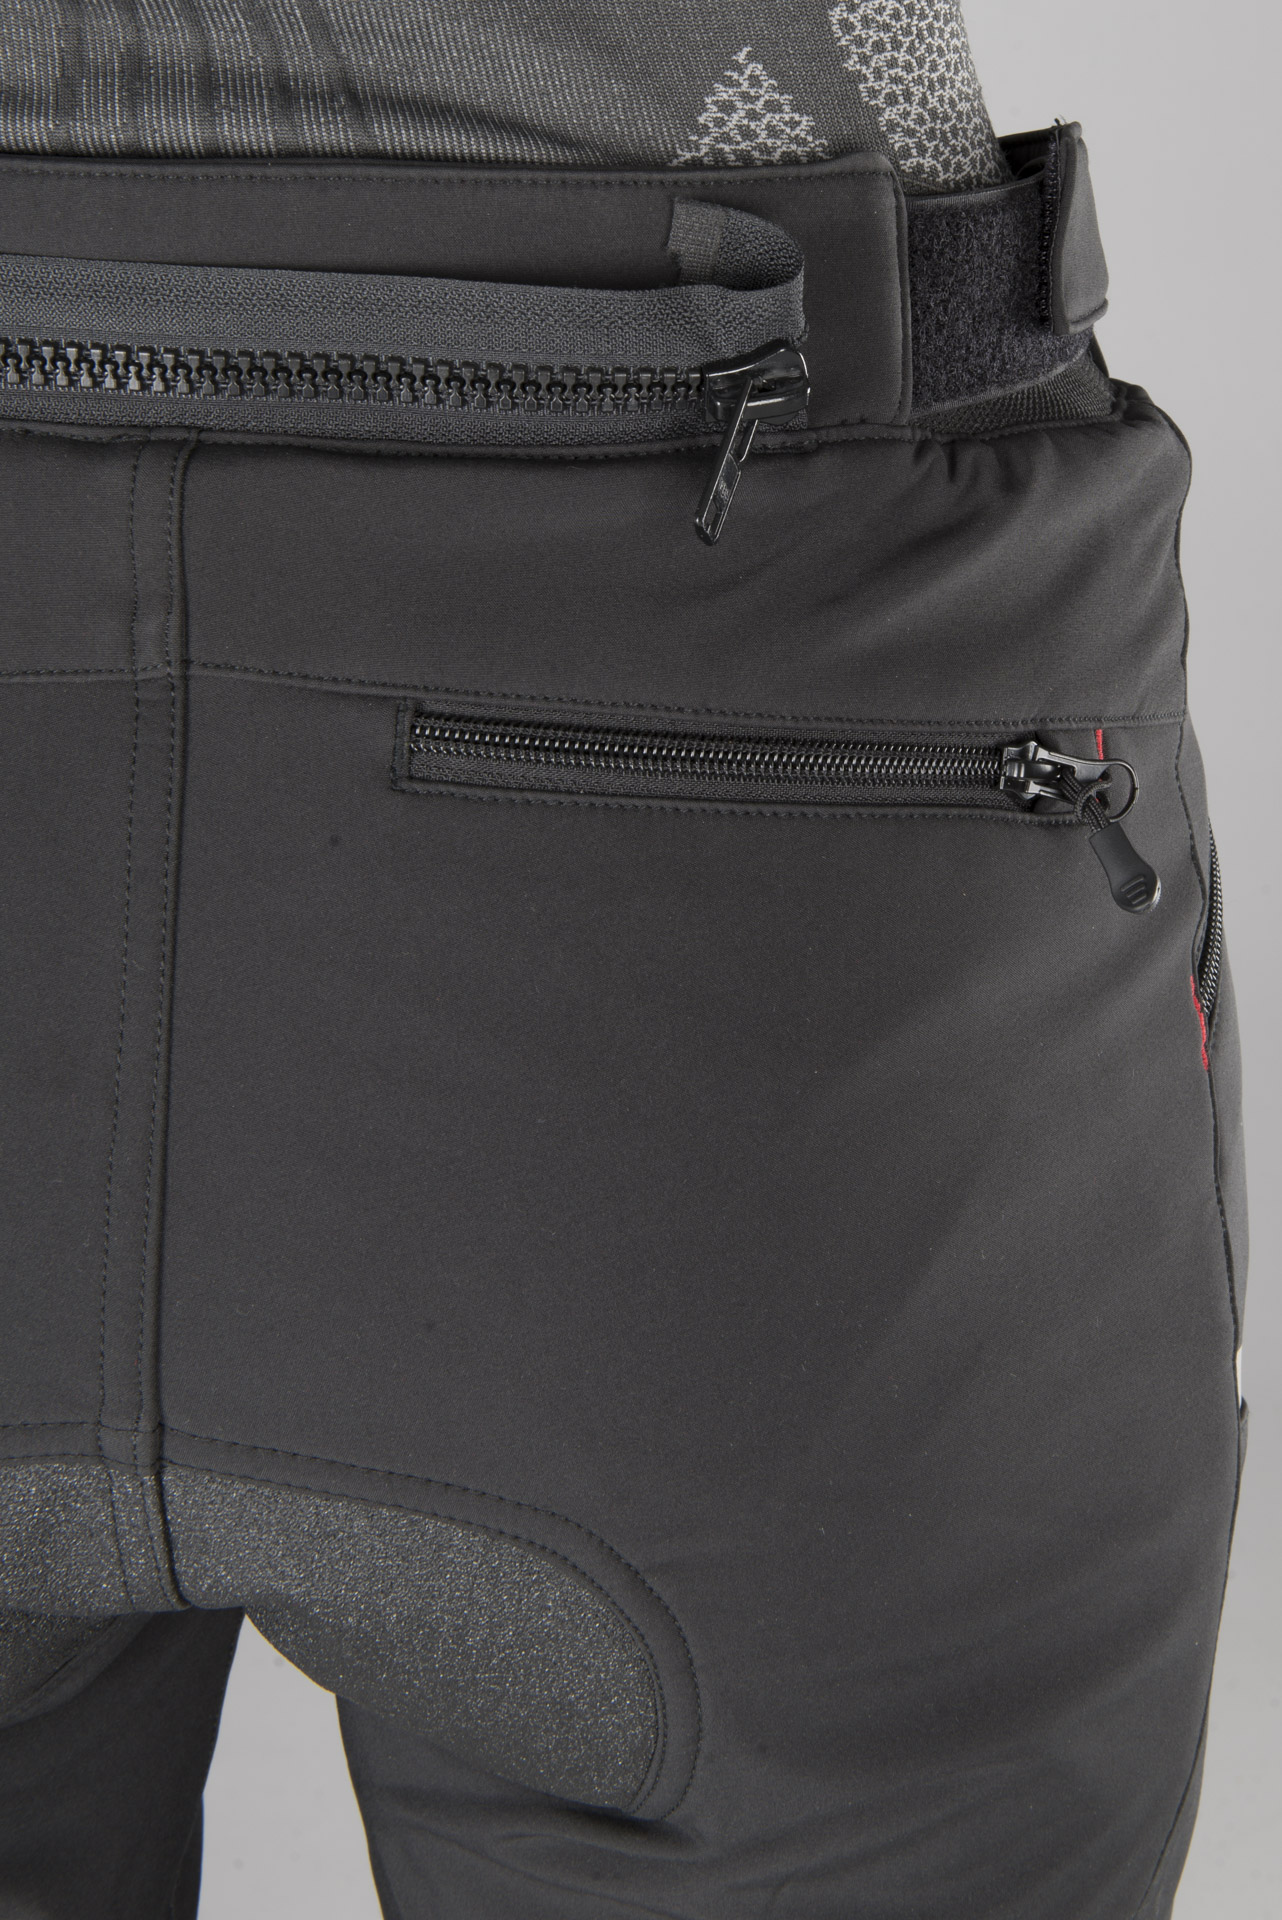 Spodnie Richa Softshell Damskie Czarne